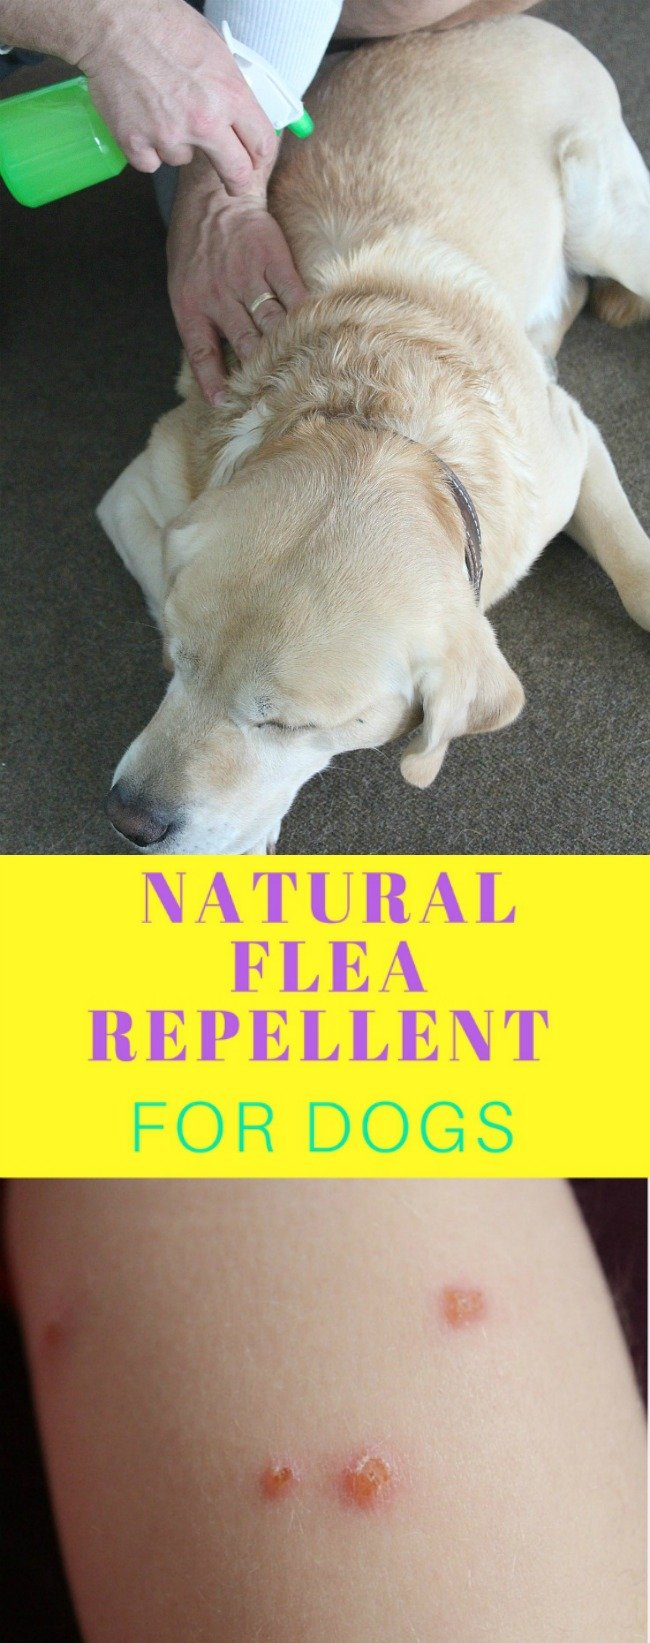 DIY Flea repellent for dogs